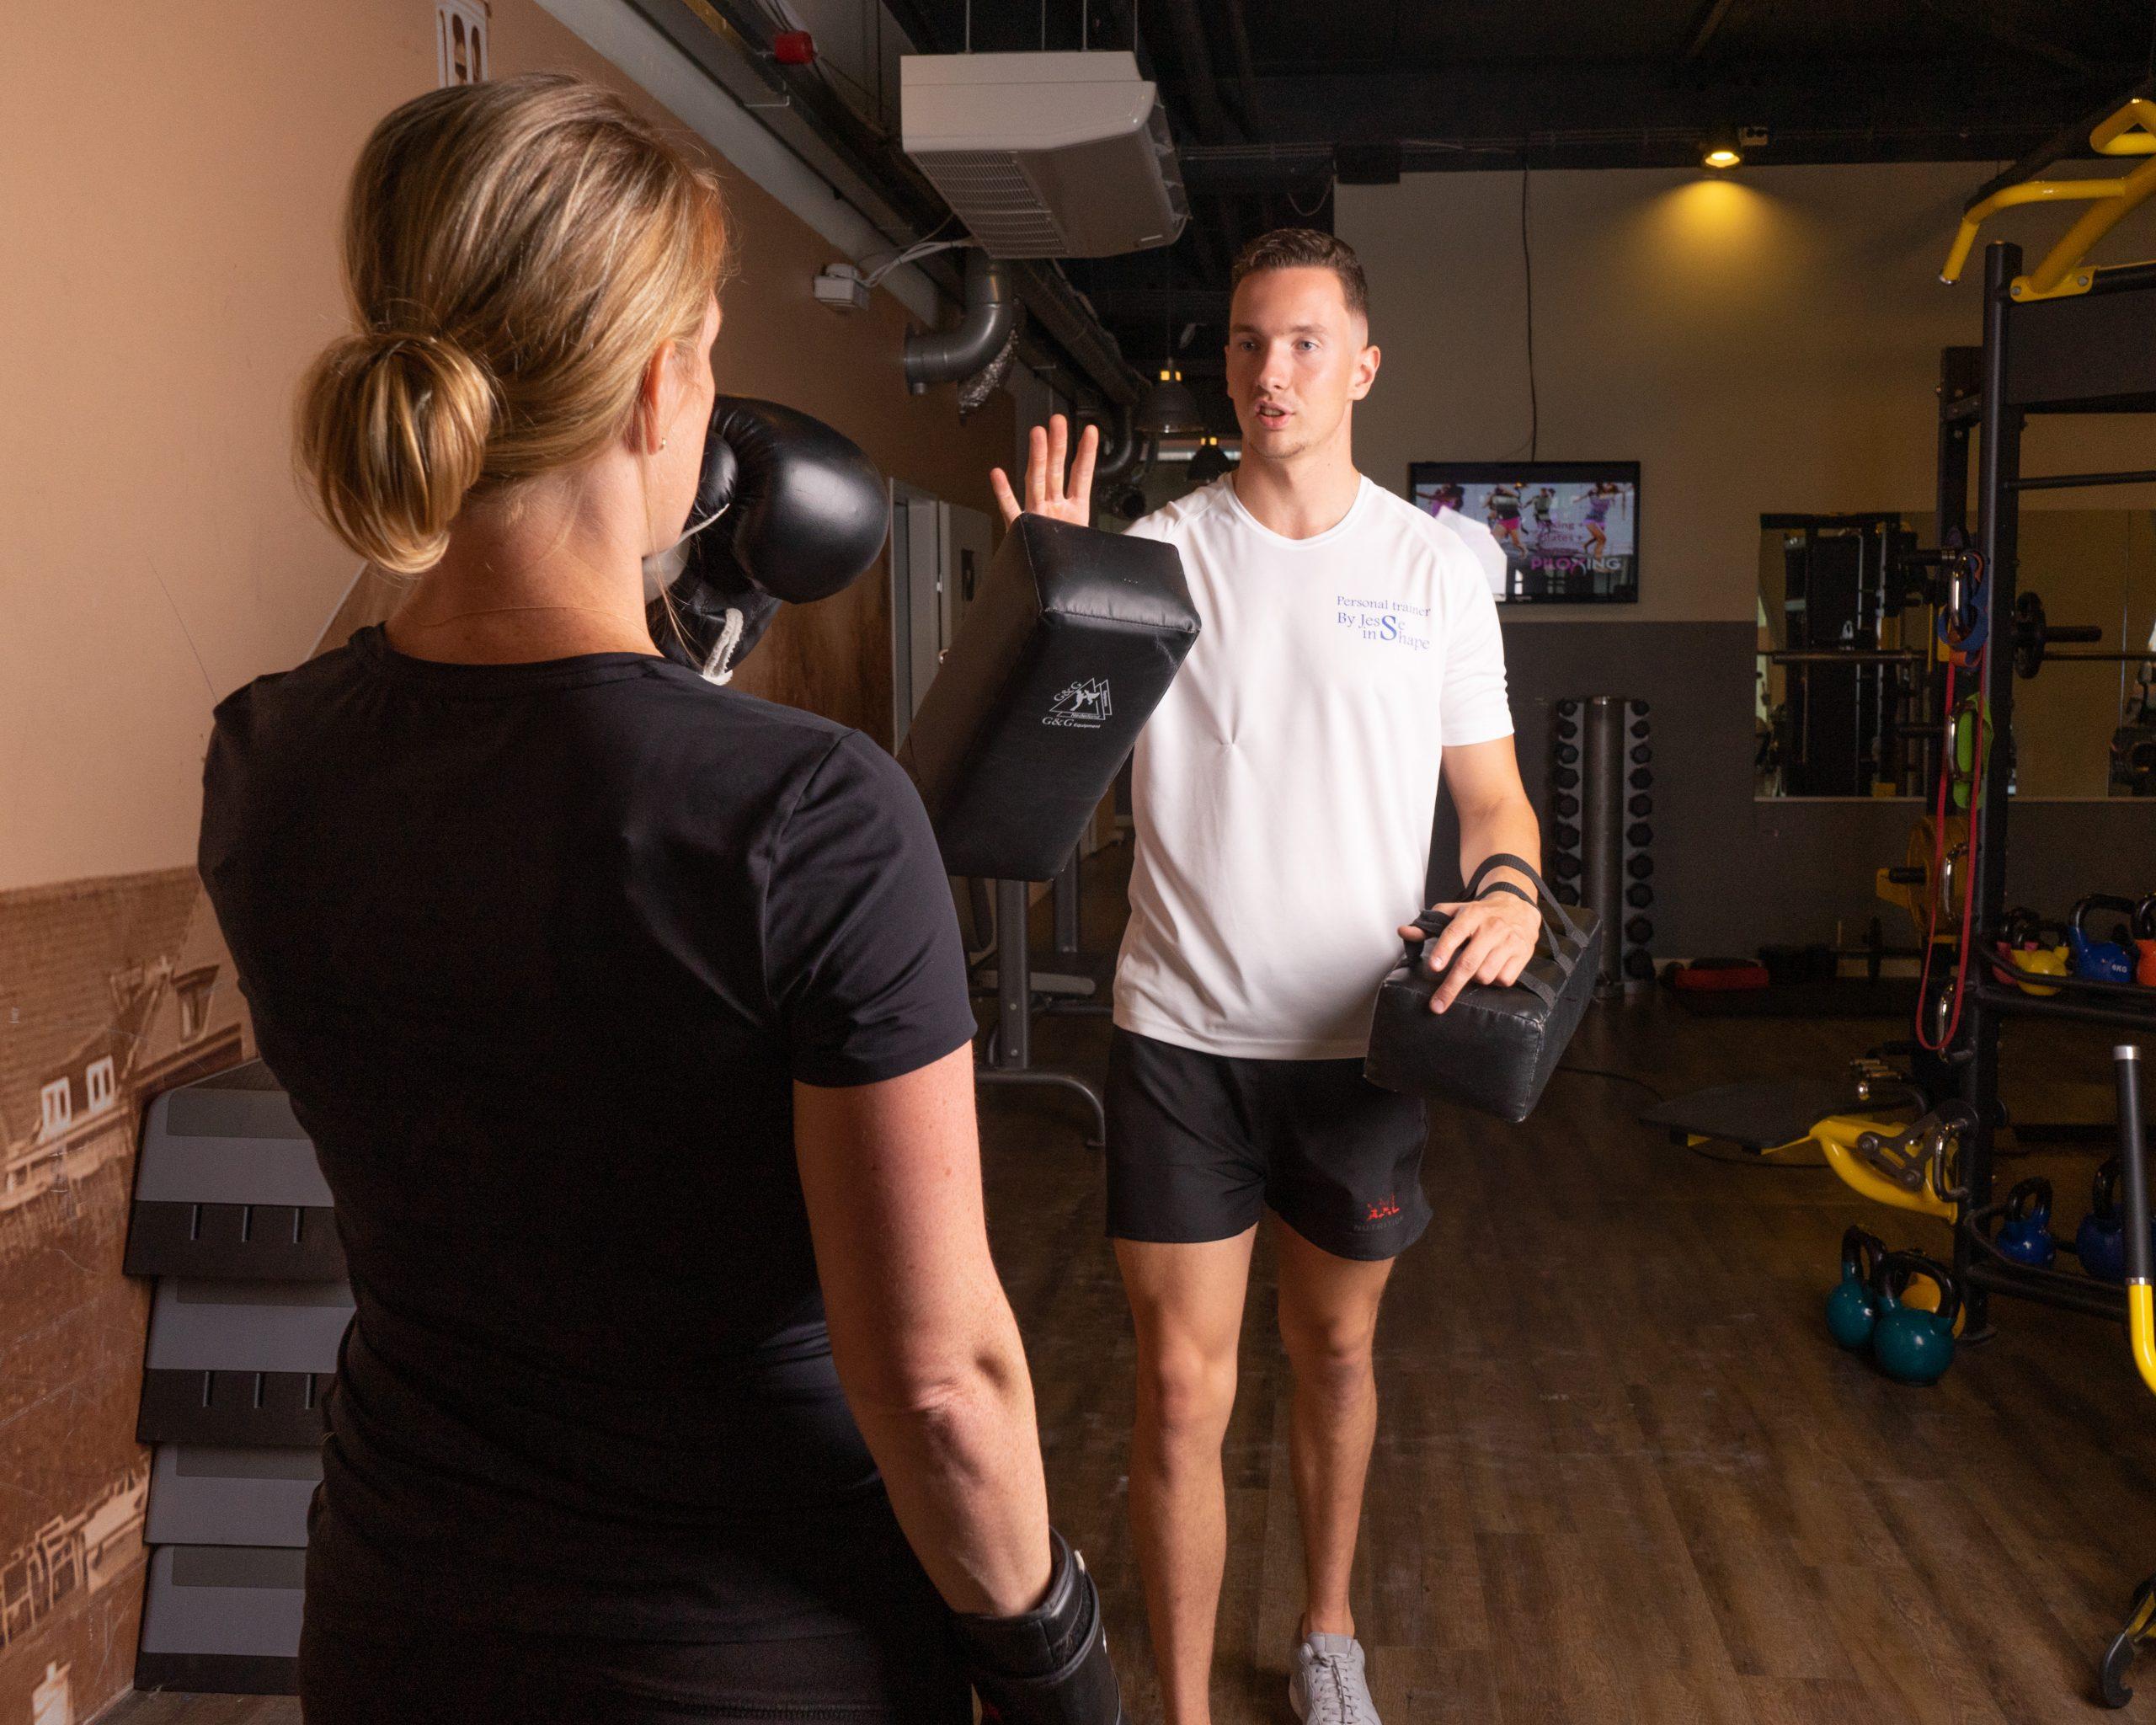 personal training boksoefeningen